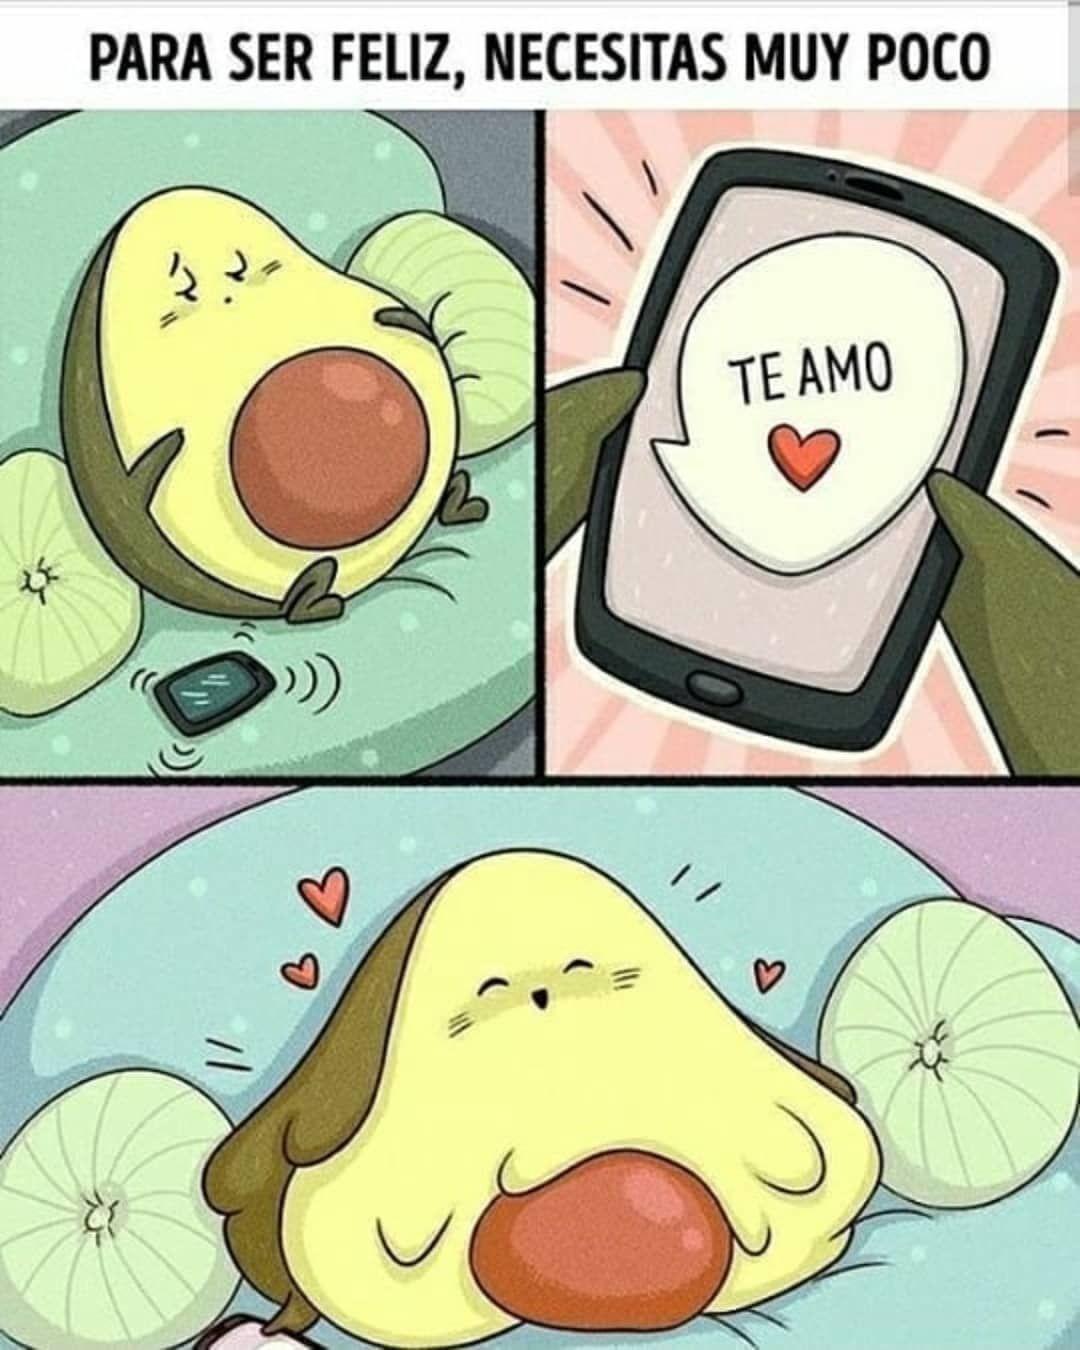 [New] The 10 Best Home Decor (with Pictures) -  Sígueme @posteoscotidianos . . . . #likeforfollow #sentimientos #instagood #frases #mascotas #foto #arte #perro #comics #follow #amor #pensamientos #uruguay #love #quotes #instart #comic #viñeta #dibujo #color #venezuela #gay #mood #humor #drawing #art #dog #me